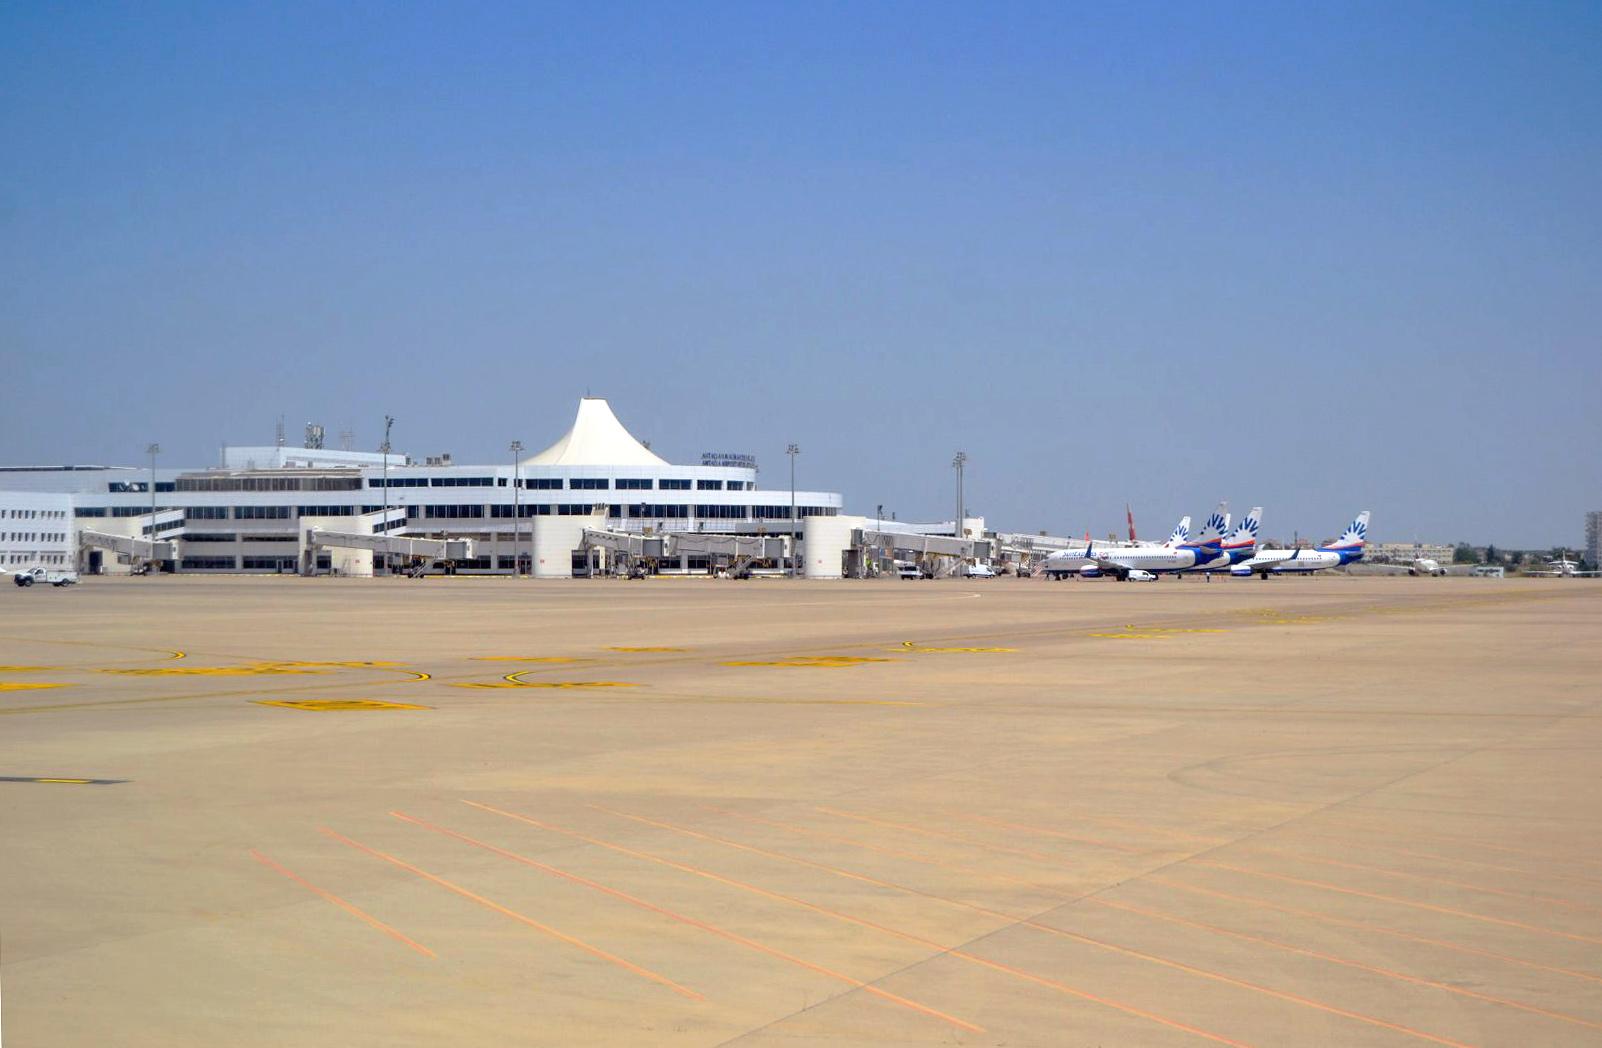 Вид с перрона на Терминал 2 аэропорта Анталья